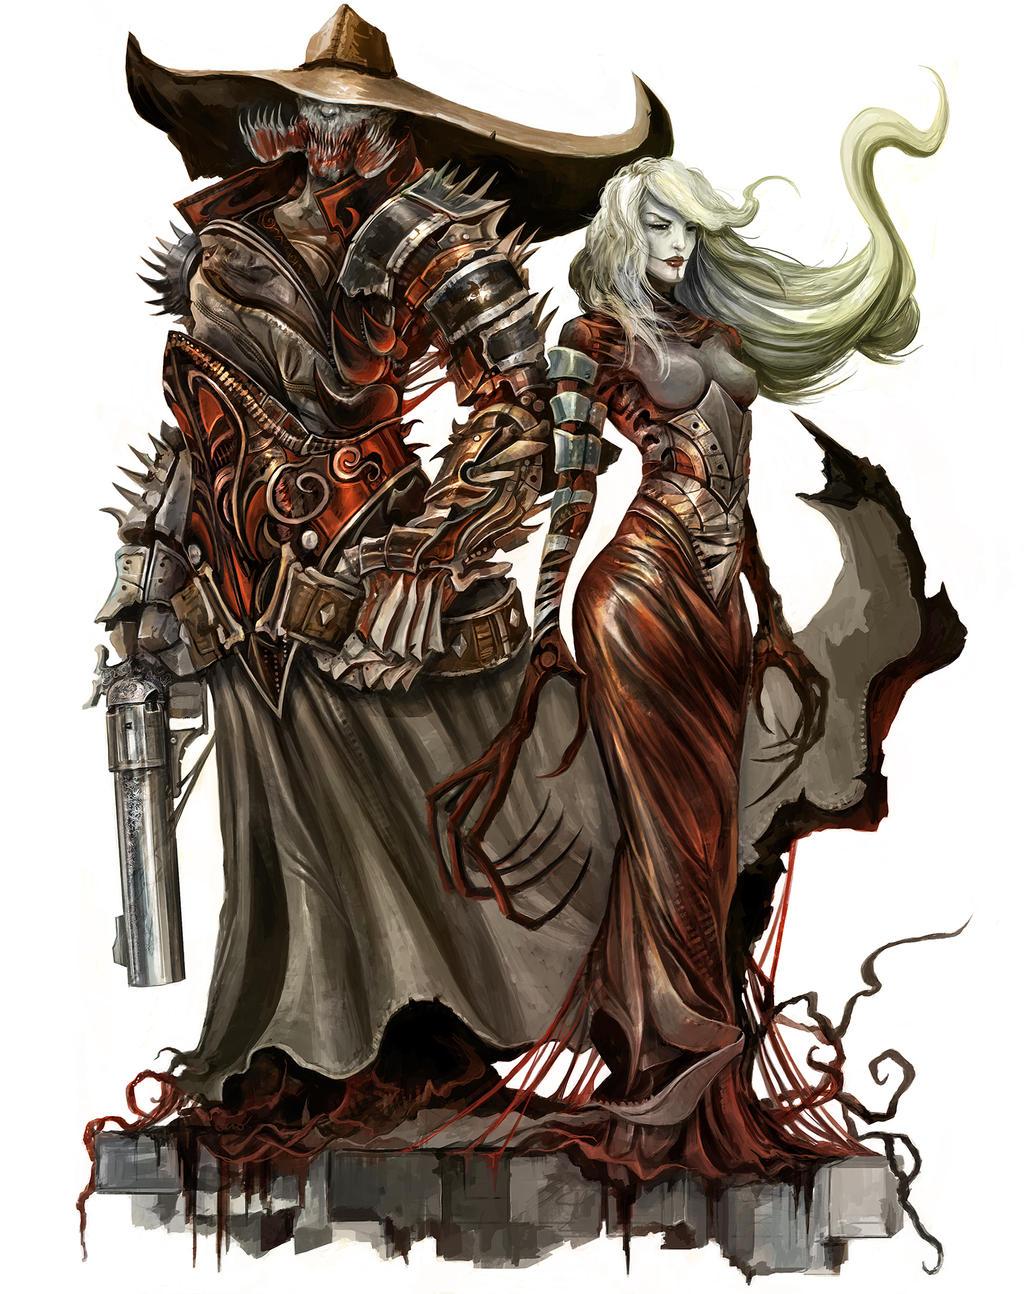 Galeria de Arte: Ficção & Fantasia 1 - Página 2 Vampires___shattered_rpg_by_eyardt-d7msmi2